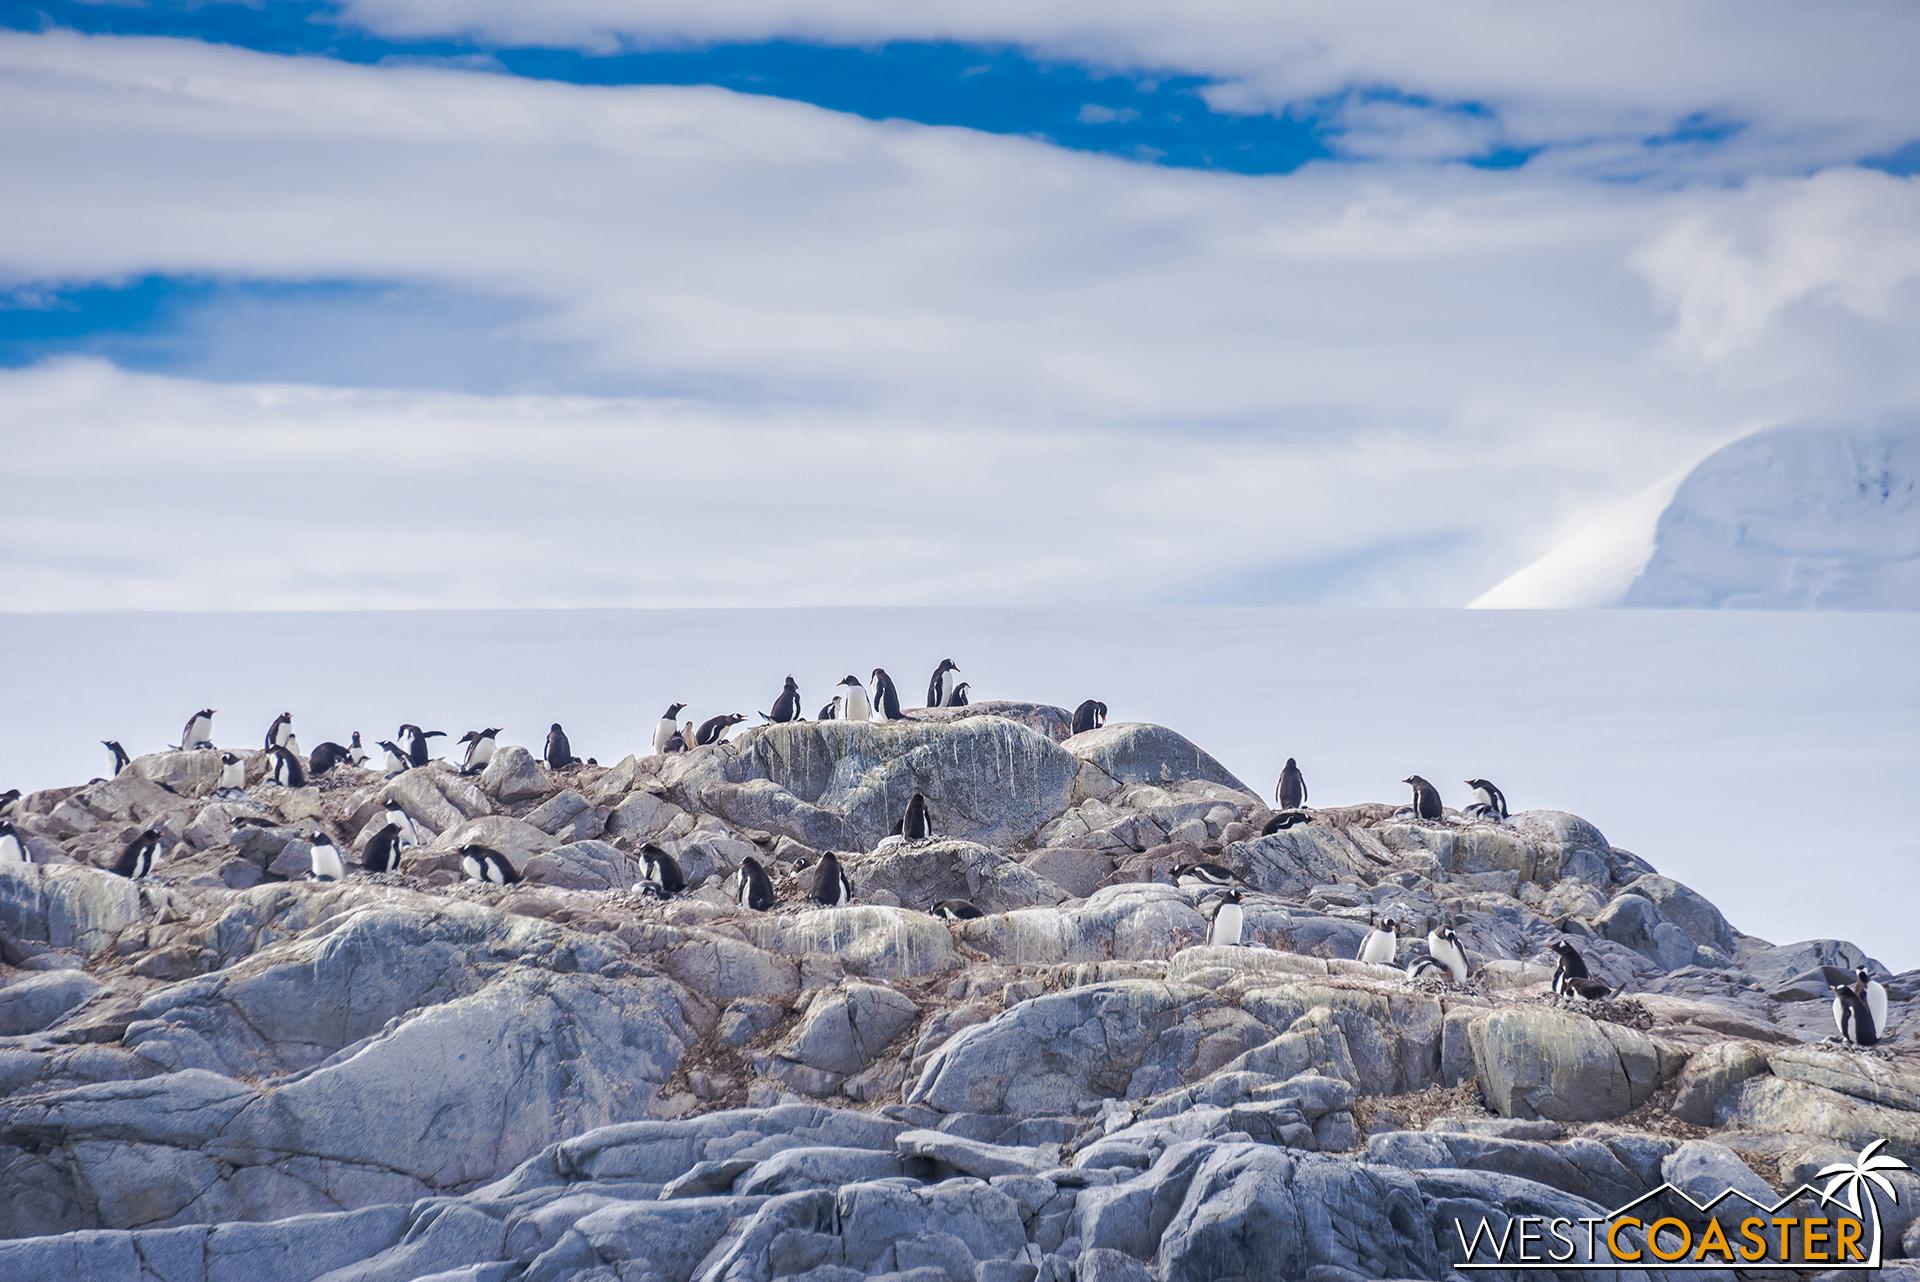 More Gentoo penguins on the neighboring island.